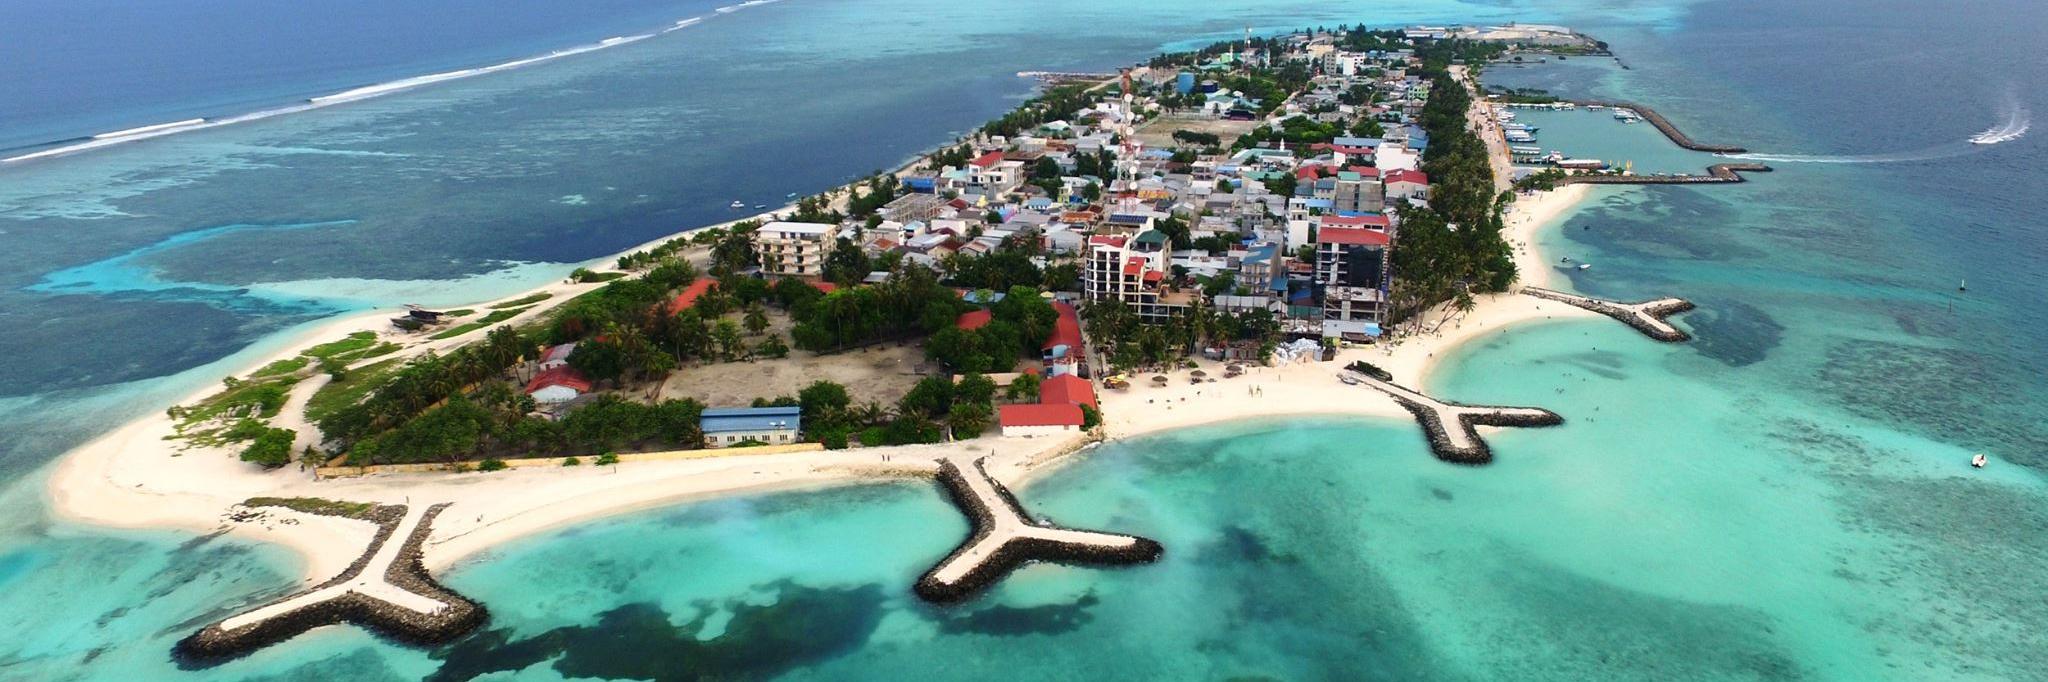 https://gody.vn/blog/phongcachmoi2691446/post/di-bui-maldives-7172